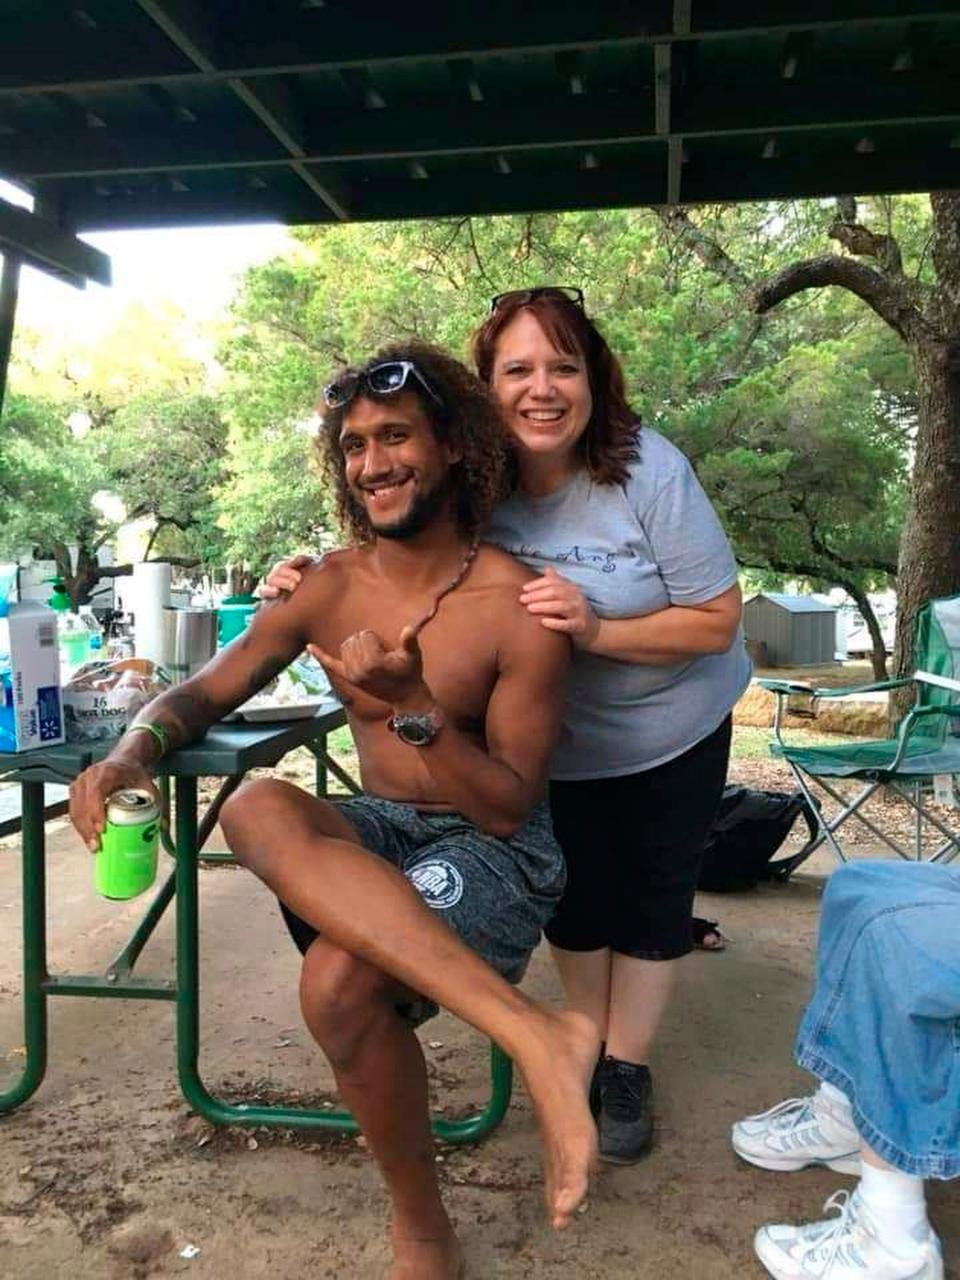 This June 2019 photo provided by Natacha Mendenhall shows Casey Williamson, left, and his mother Carla Ajaga in Possum Kingdom Lake, Texas. (Natacha Mendenhall via AP)